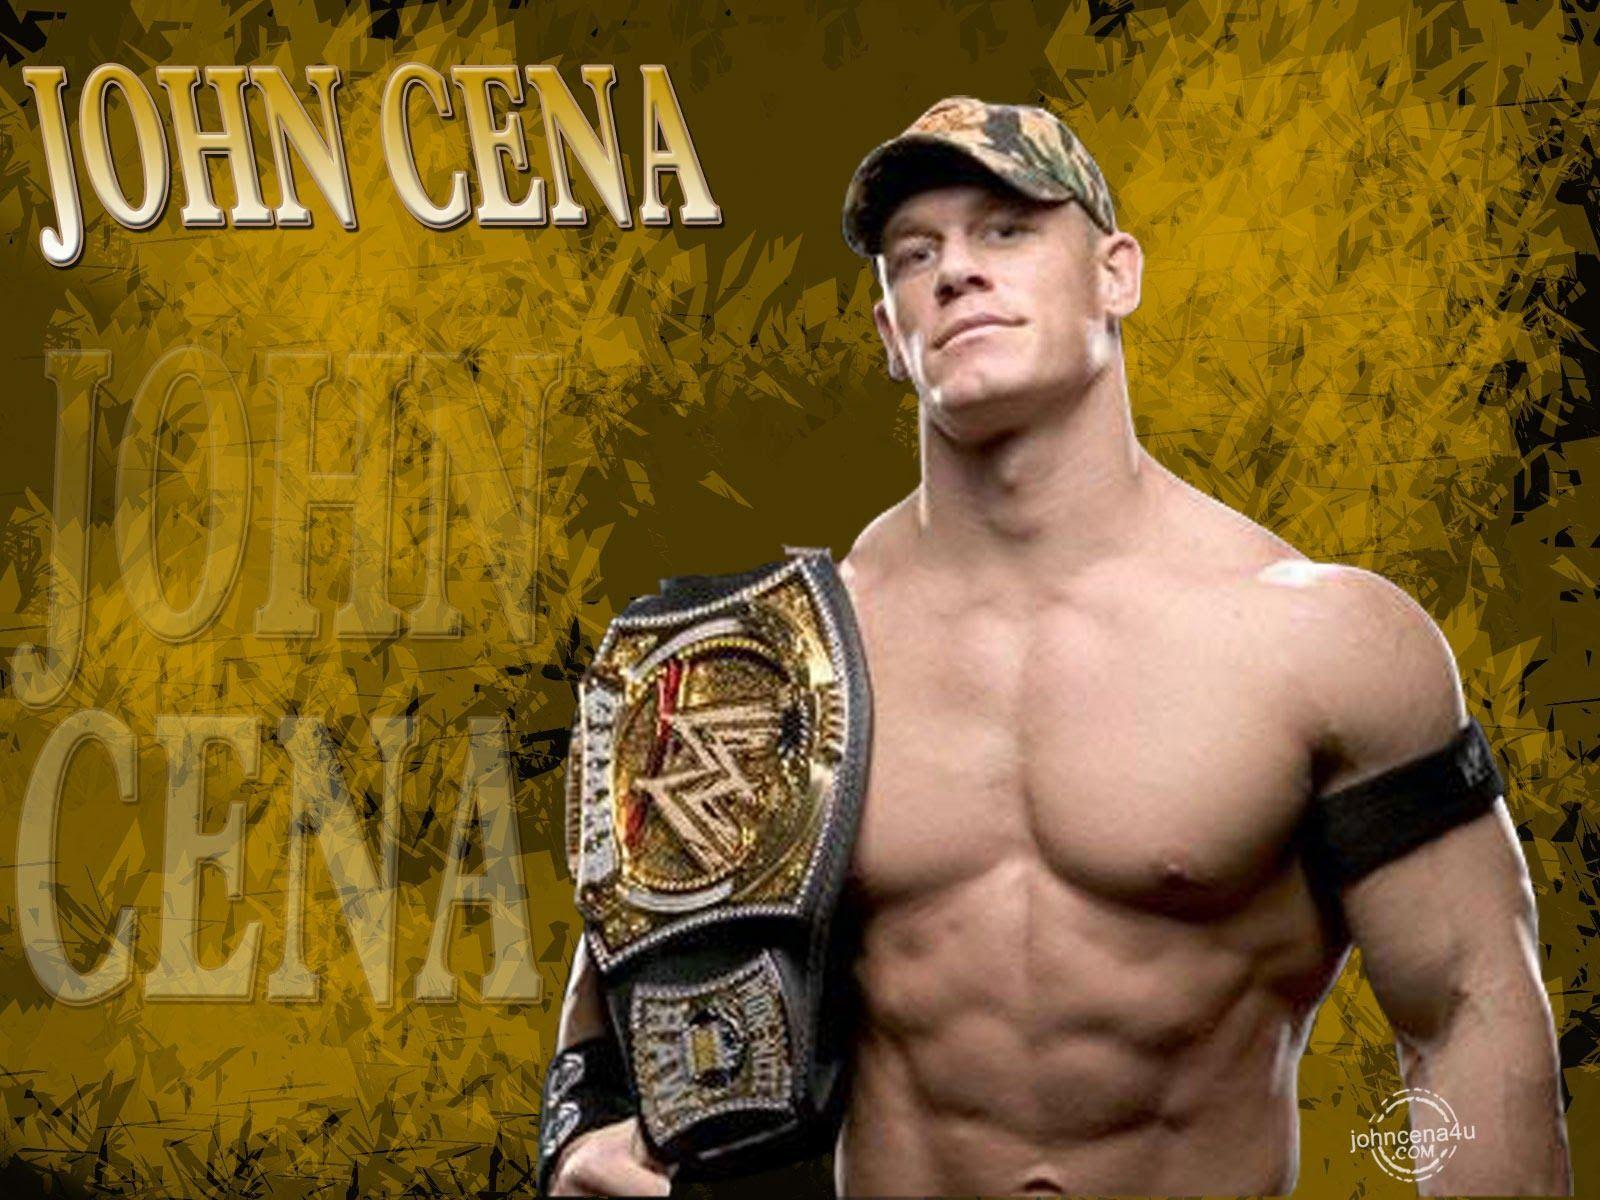 John Cena 2017 HD Wallpapers